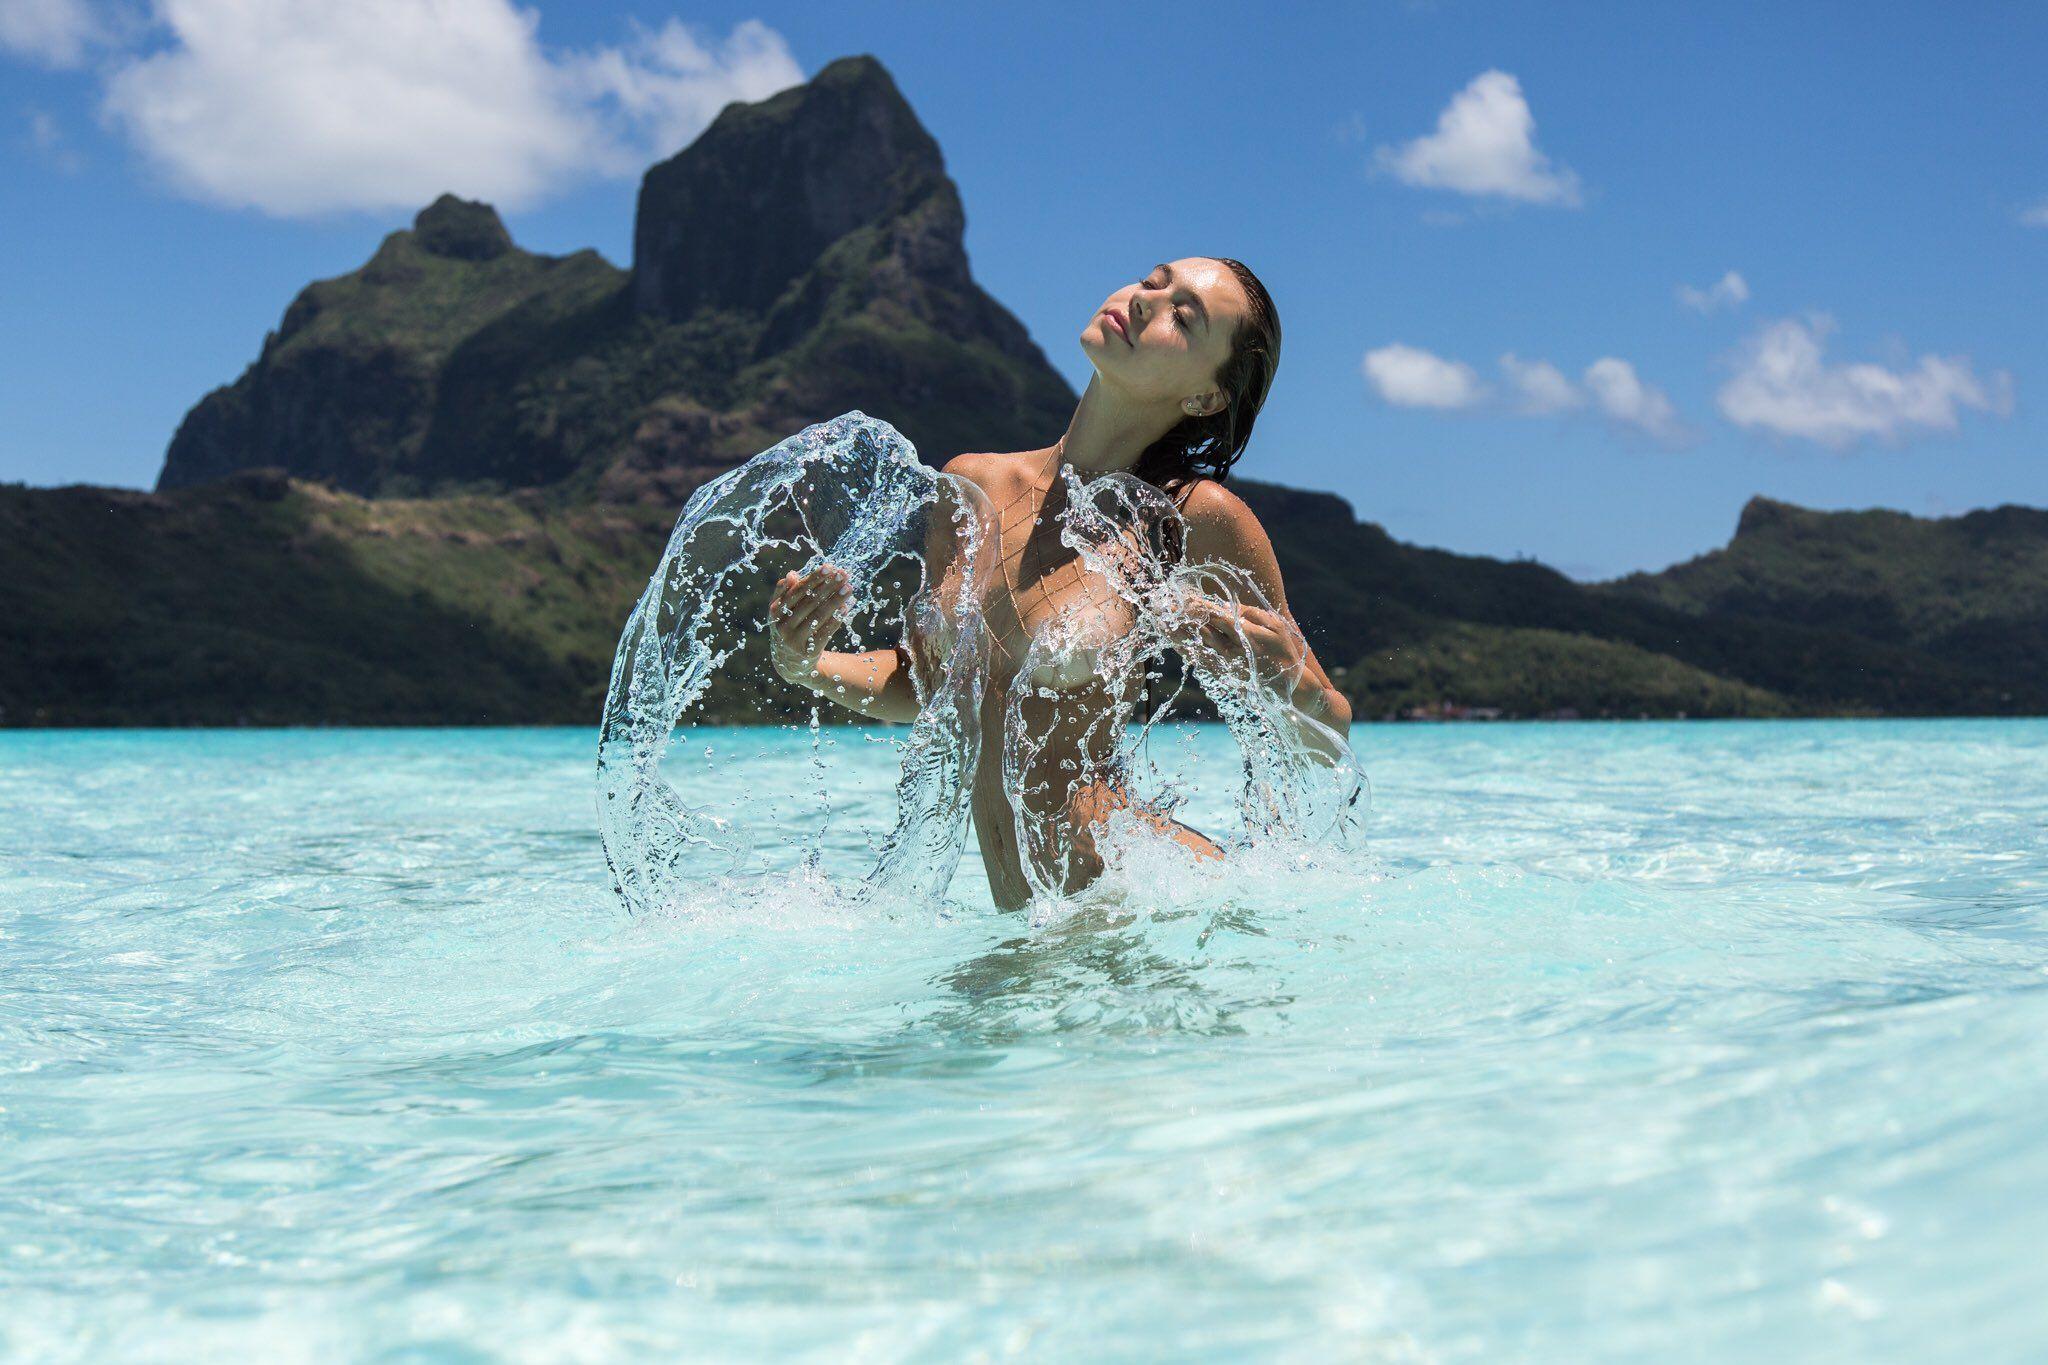 Alexis Ren in water with no top